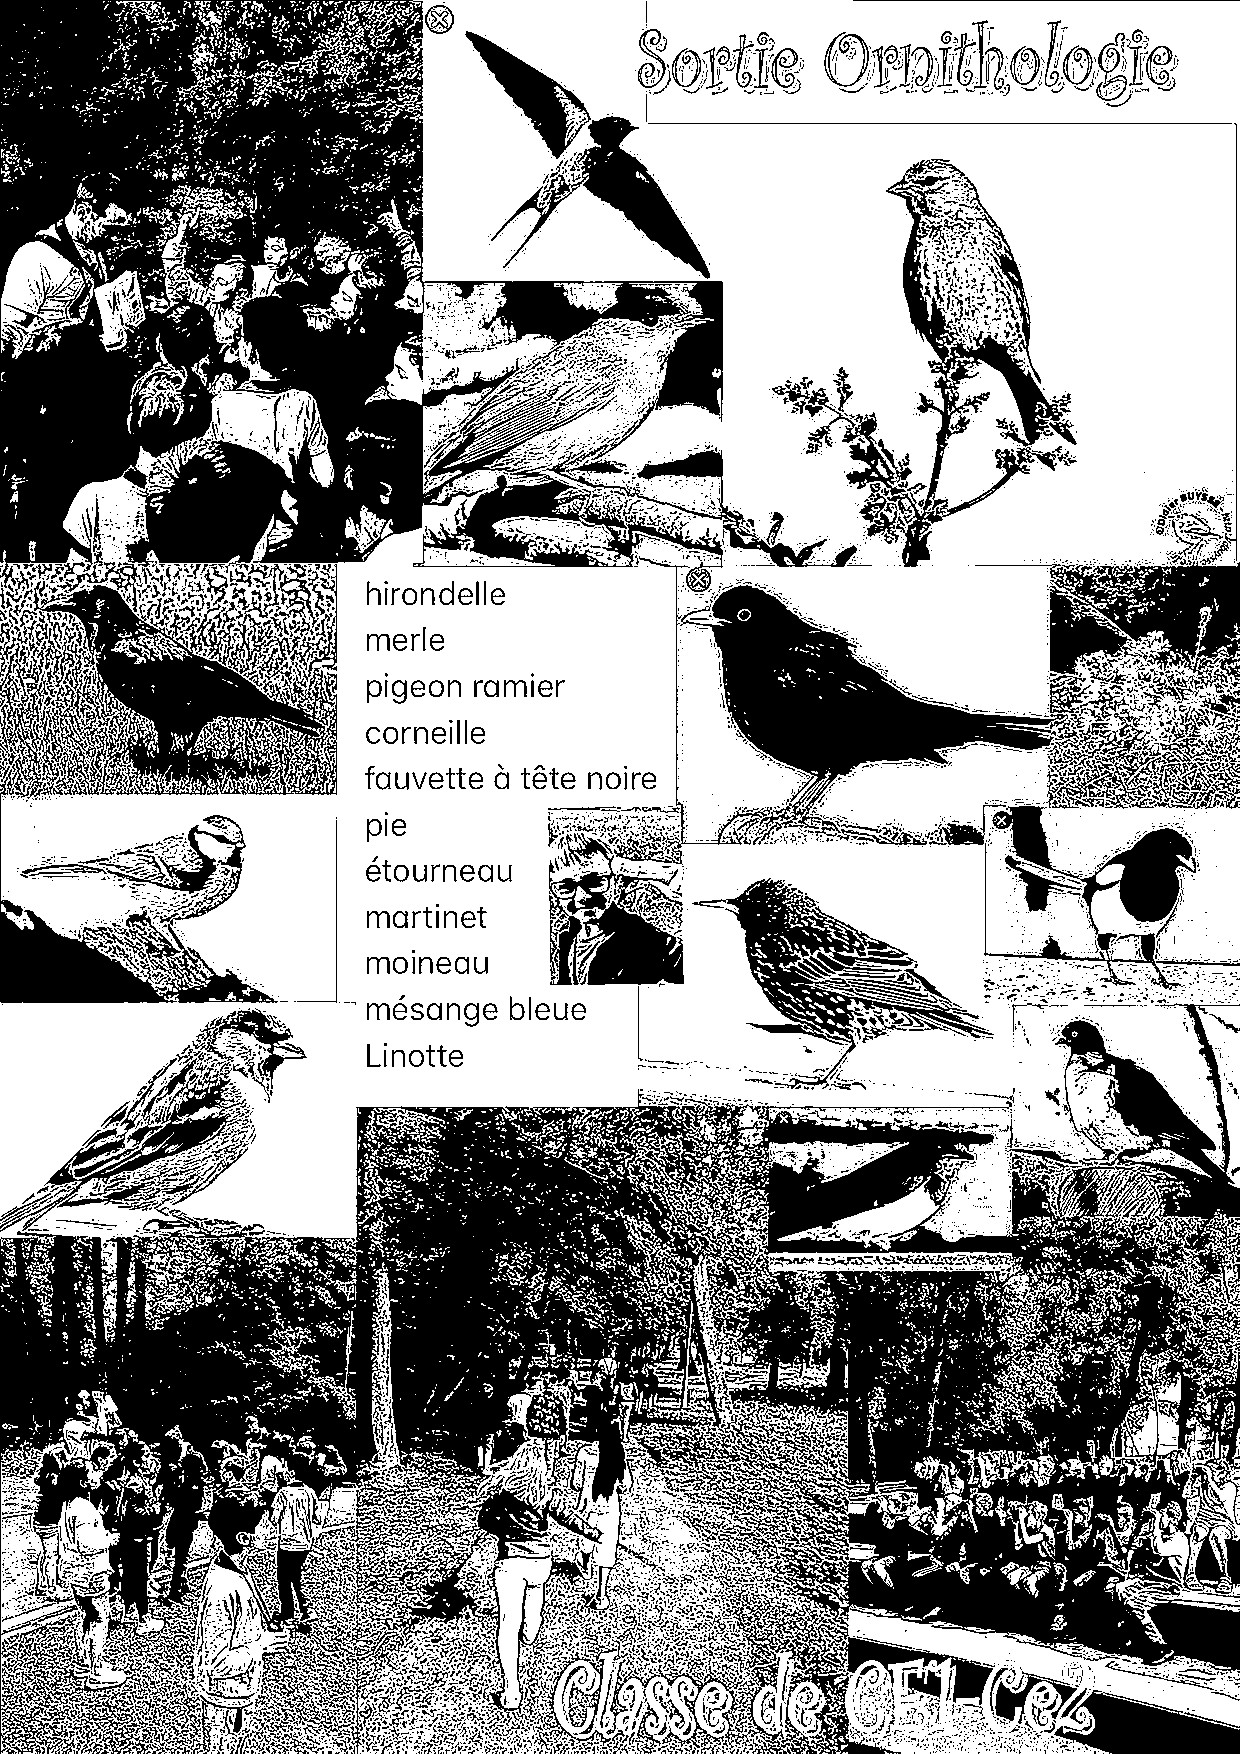 Affiche Sortie Ornithologie 11.jpg